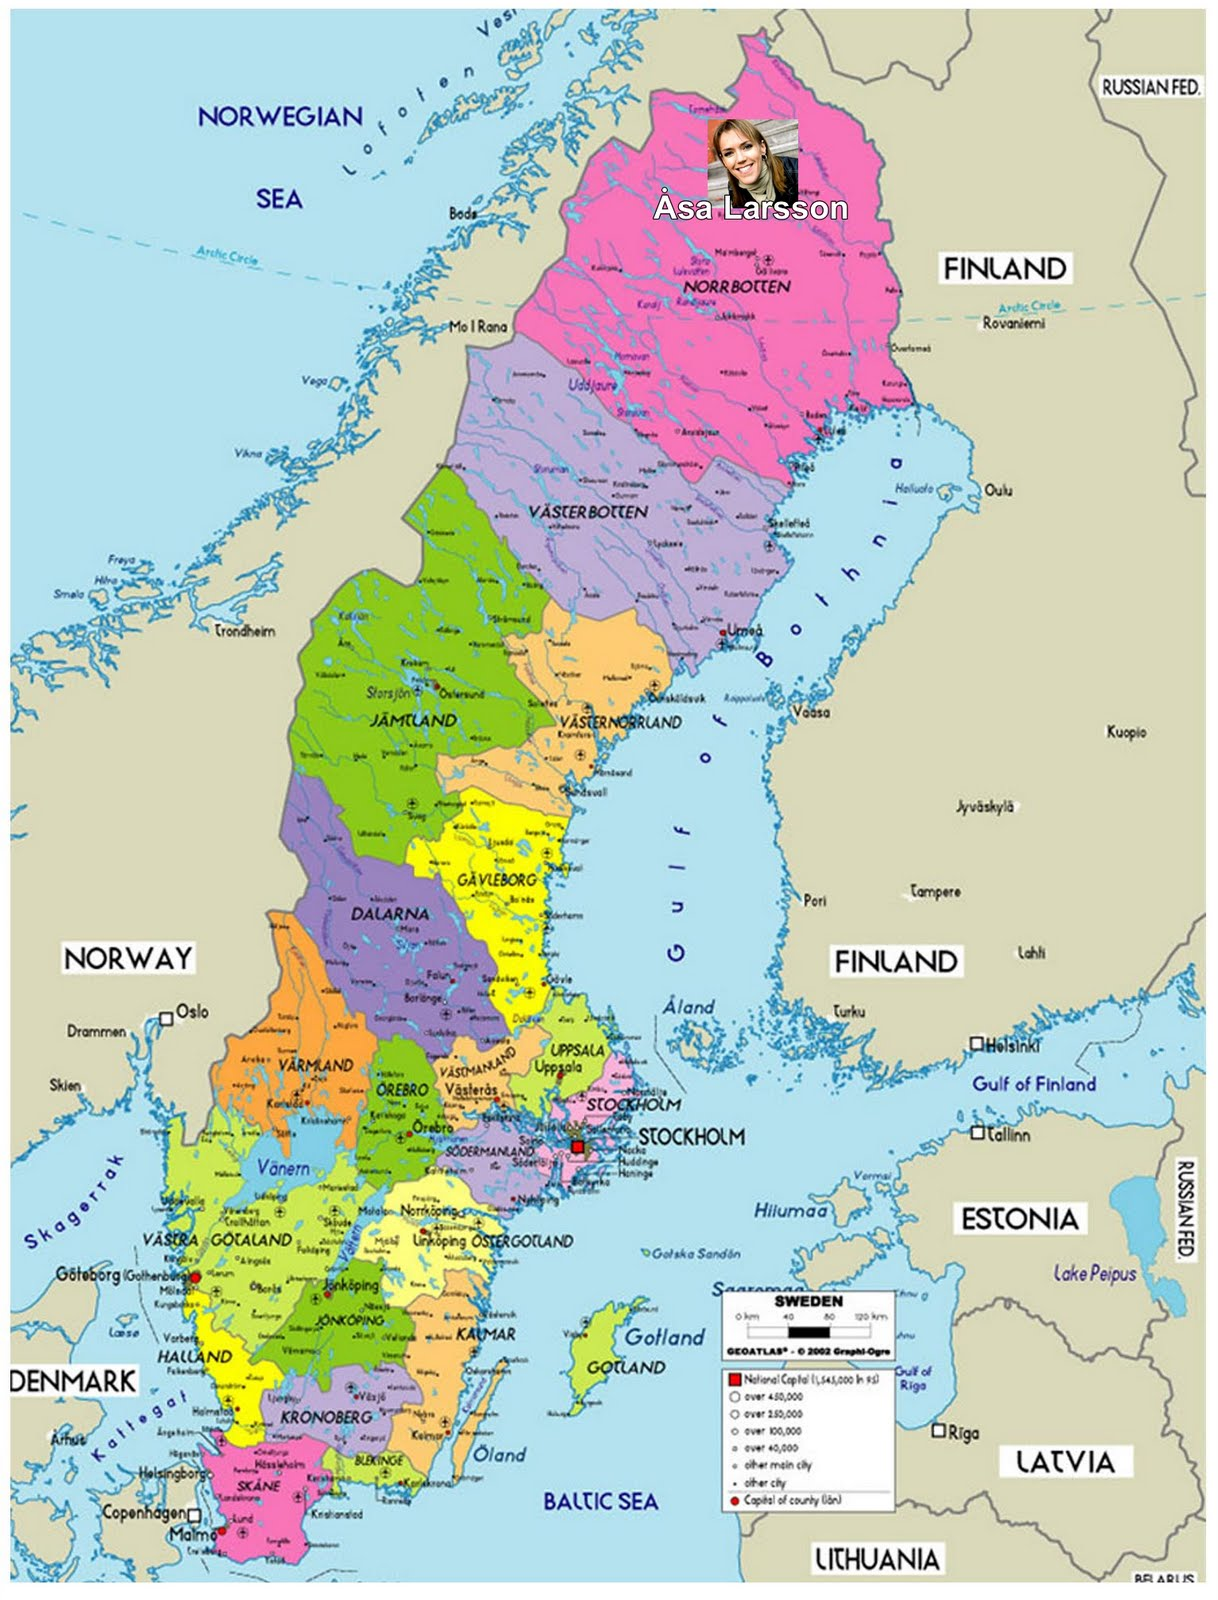 suecia mapa Mapa Geografico Suecia suecia mapa